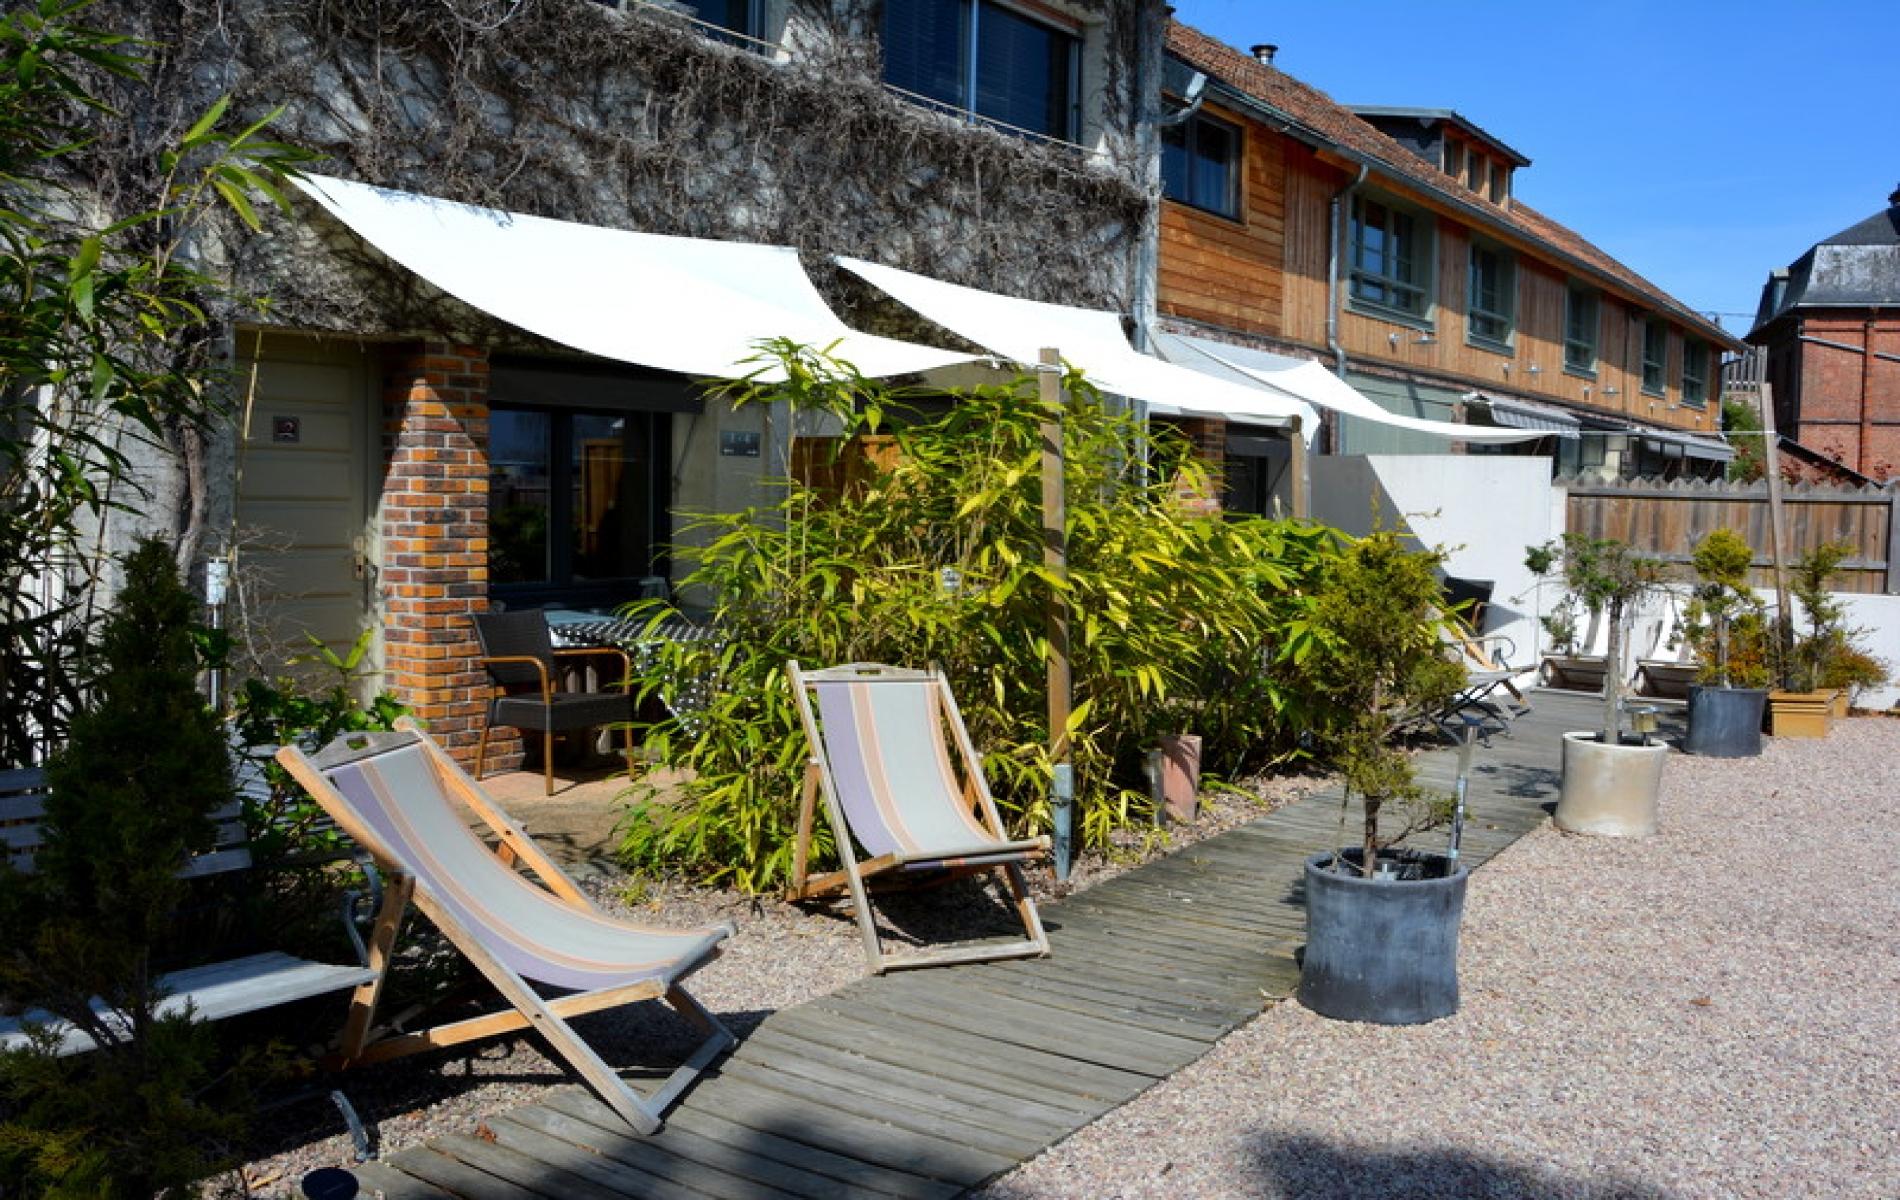 Hotel Monet - Hotel de charme en Normandie